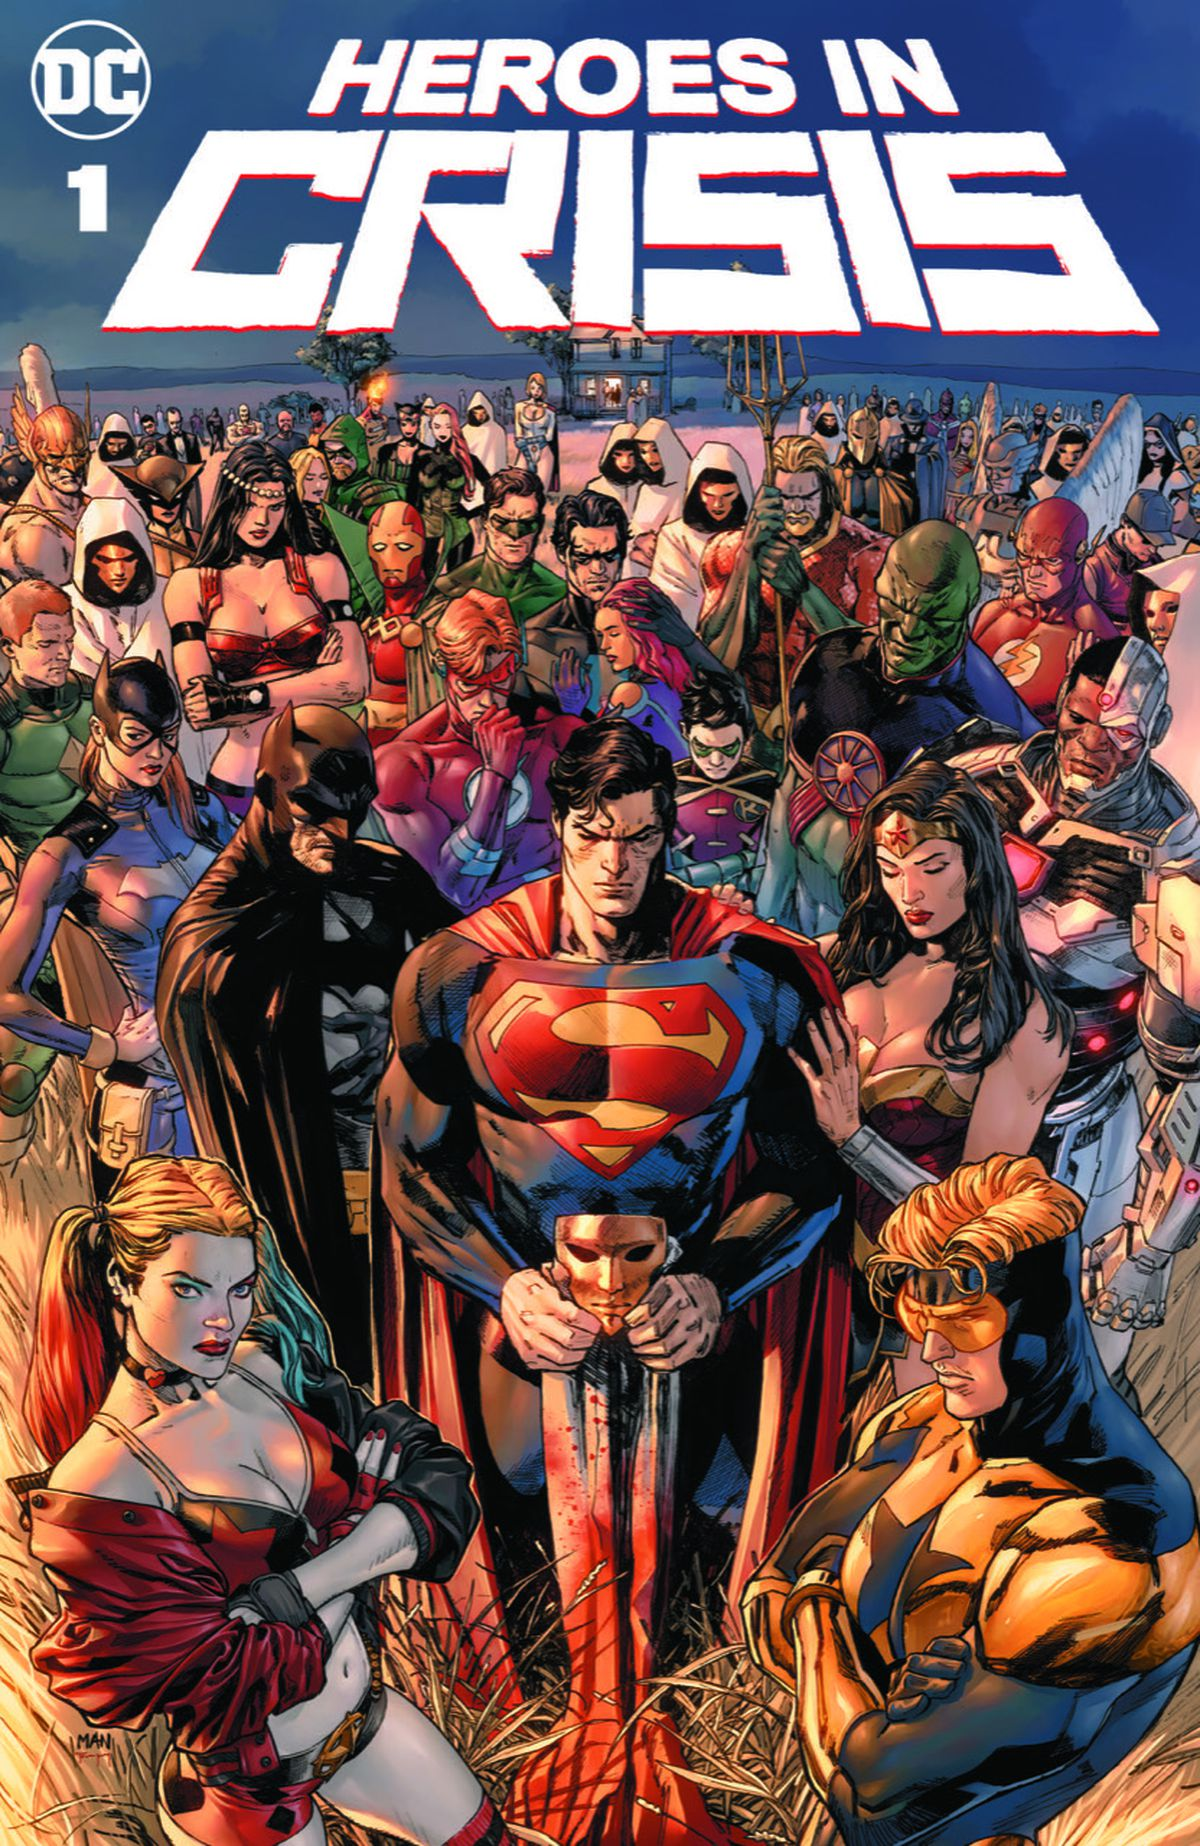 Heroes in Crisis #1, DC Comics (2018).